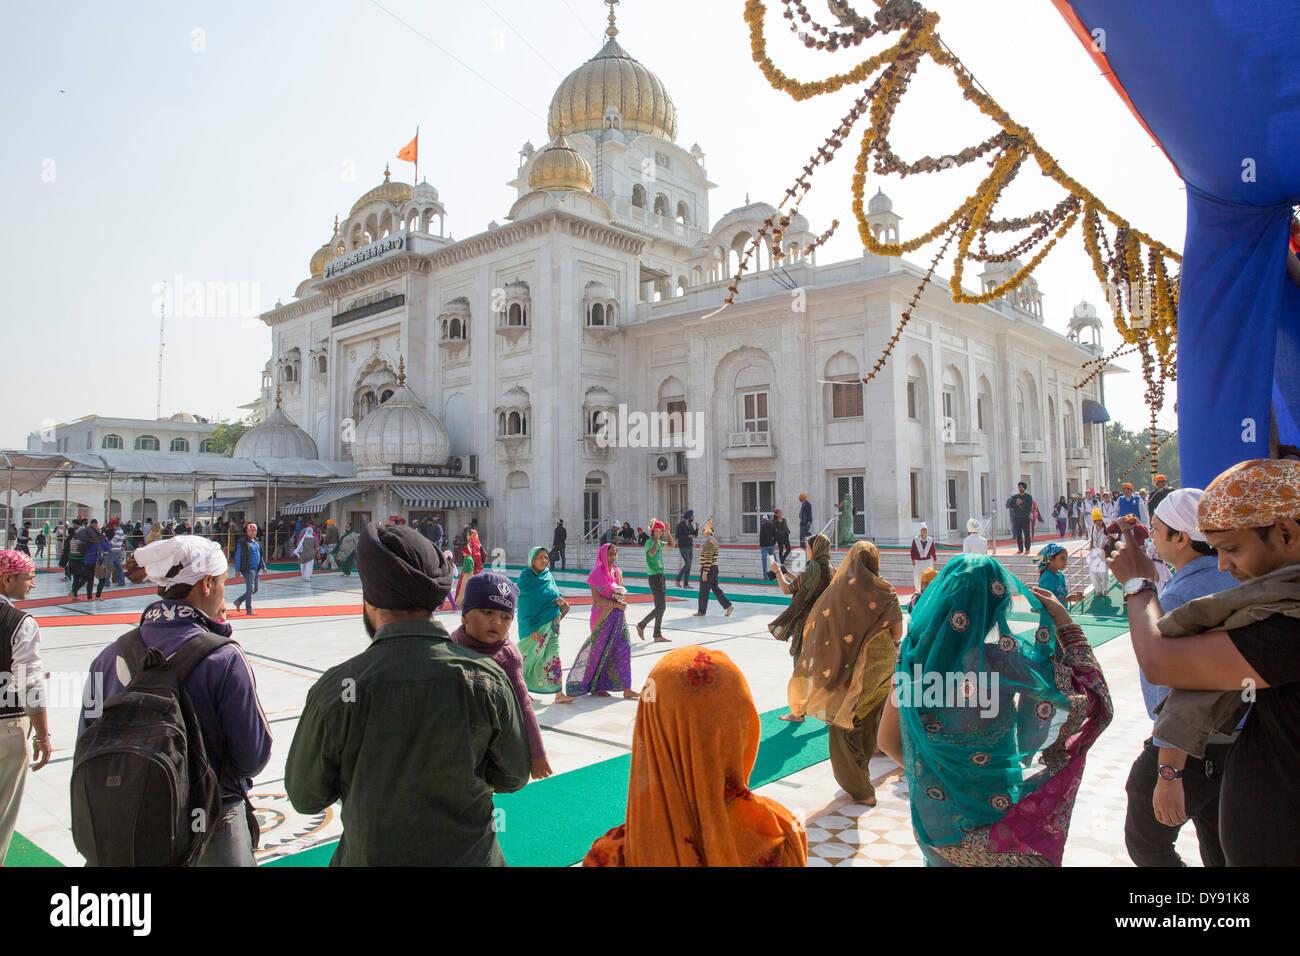 La religione sikh Gurdwara Bangla Sahib Sikh, casa di preghiera, Delhi, New Delhi, Asia, paese, città, chiesa, religione, Immagini Stock